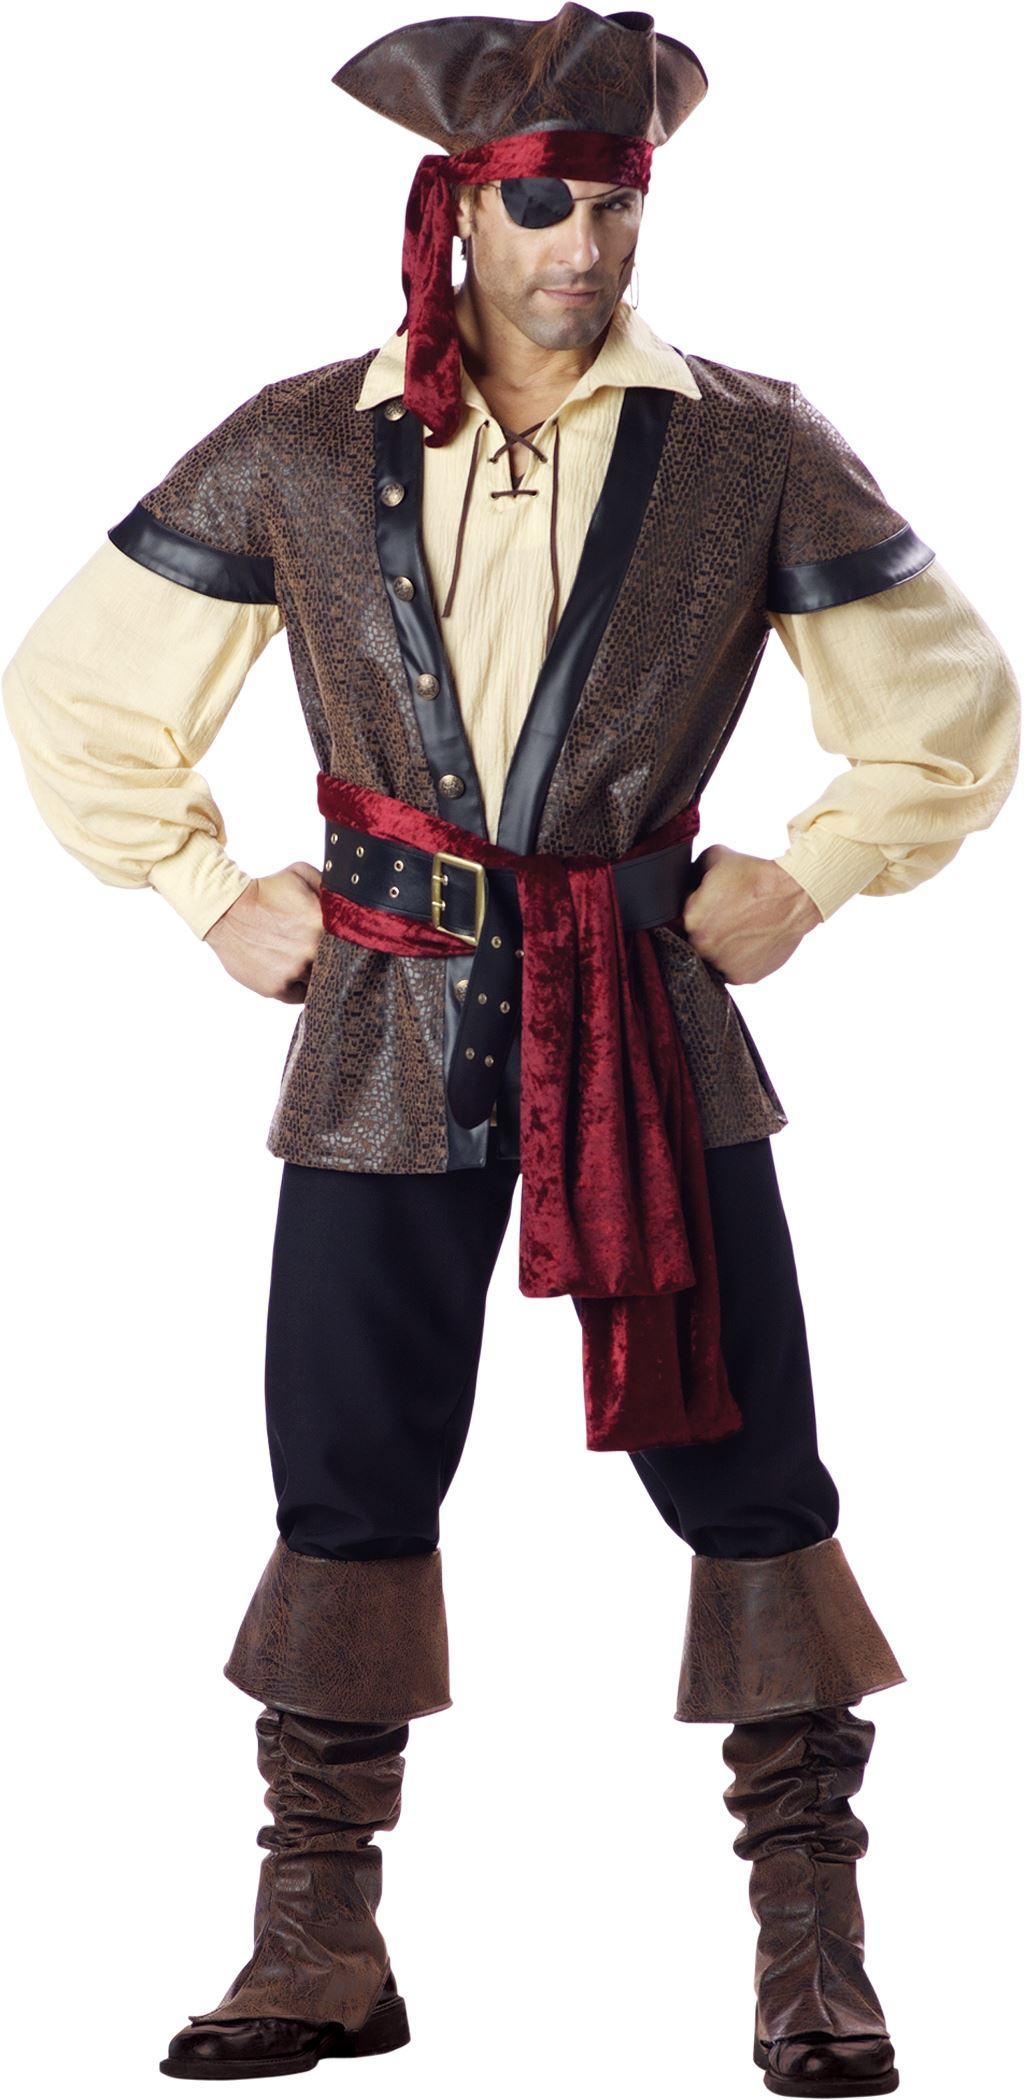 Adult Men Rustic Pirate Deluxe Men Costume | $129.99 | The Costume Land